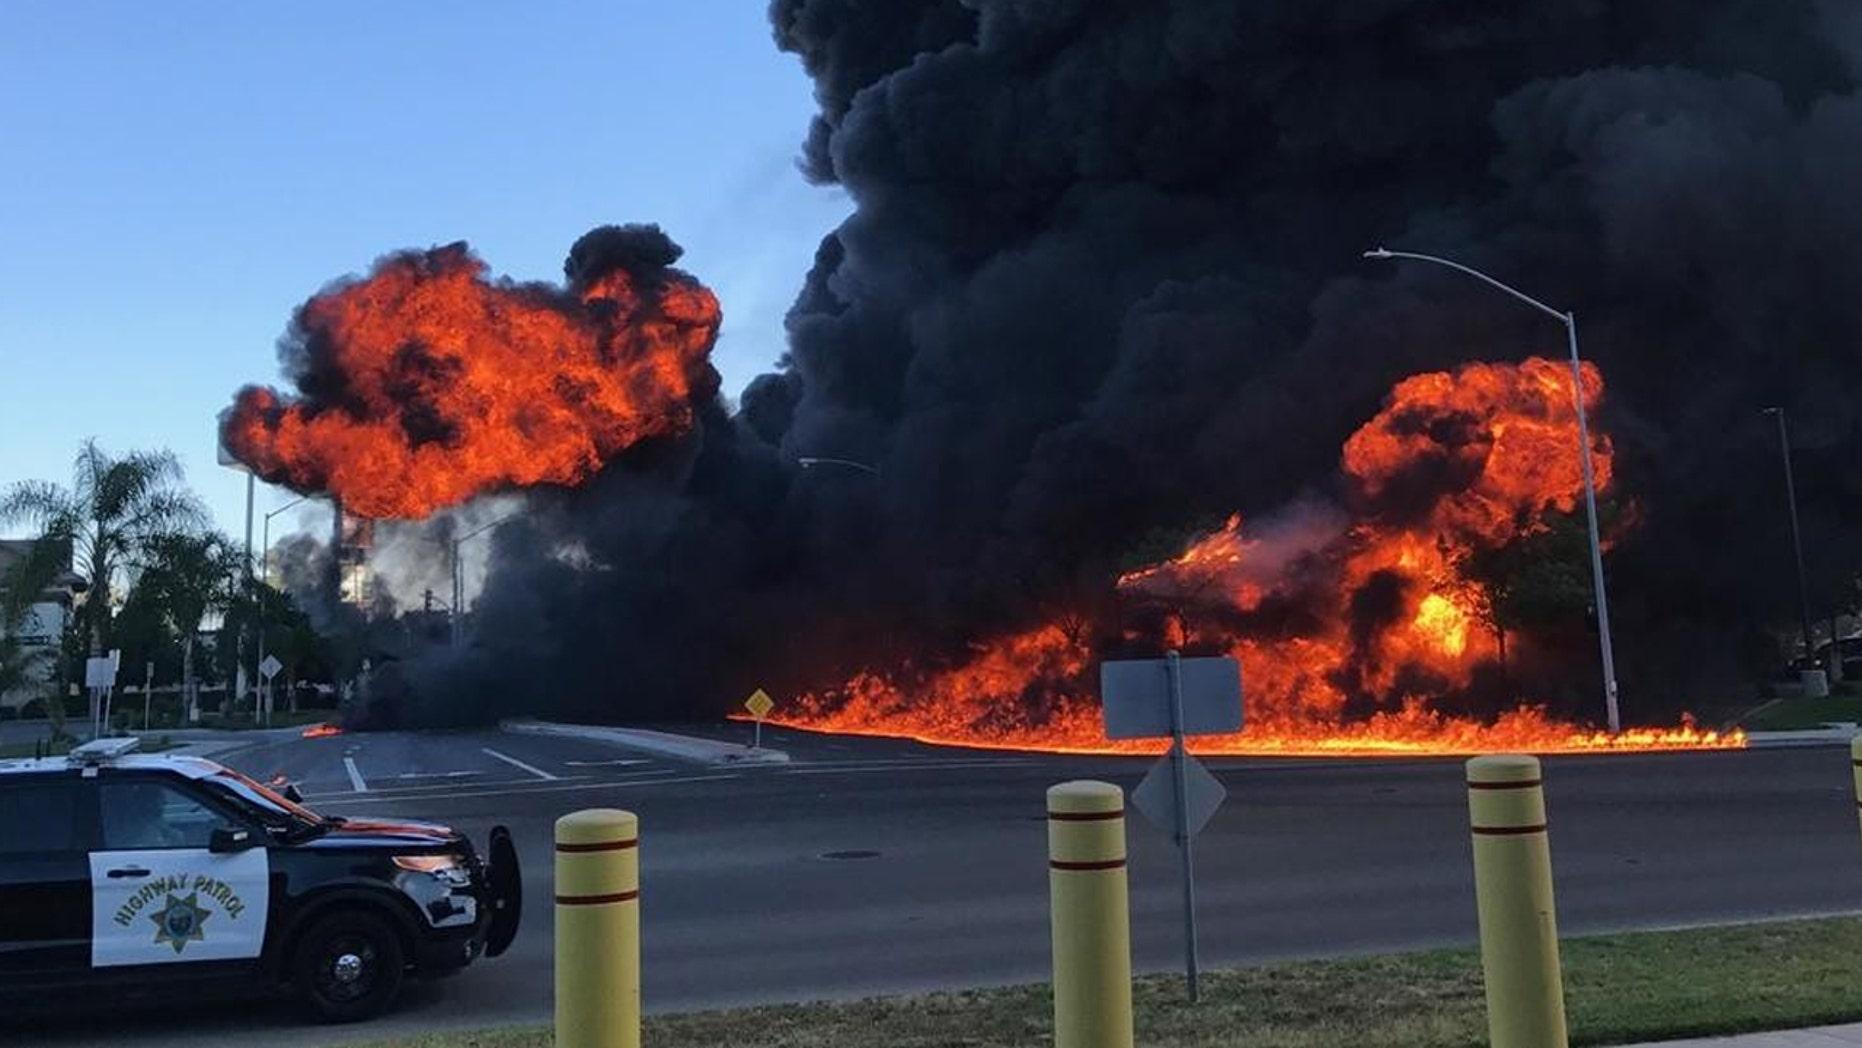 Atwater crash: One dead, massive fireball reported in